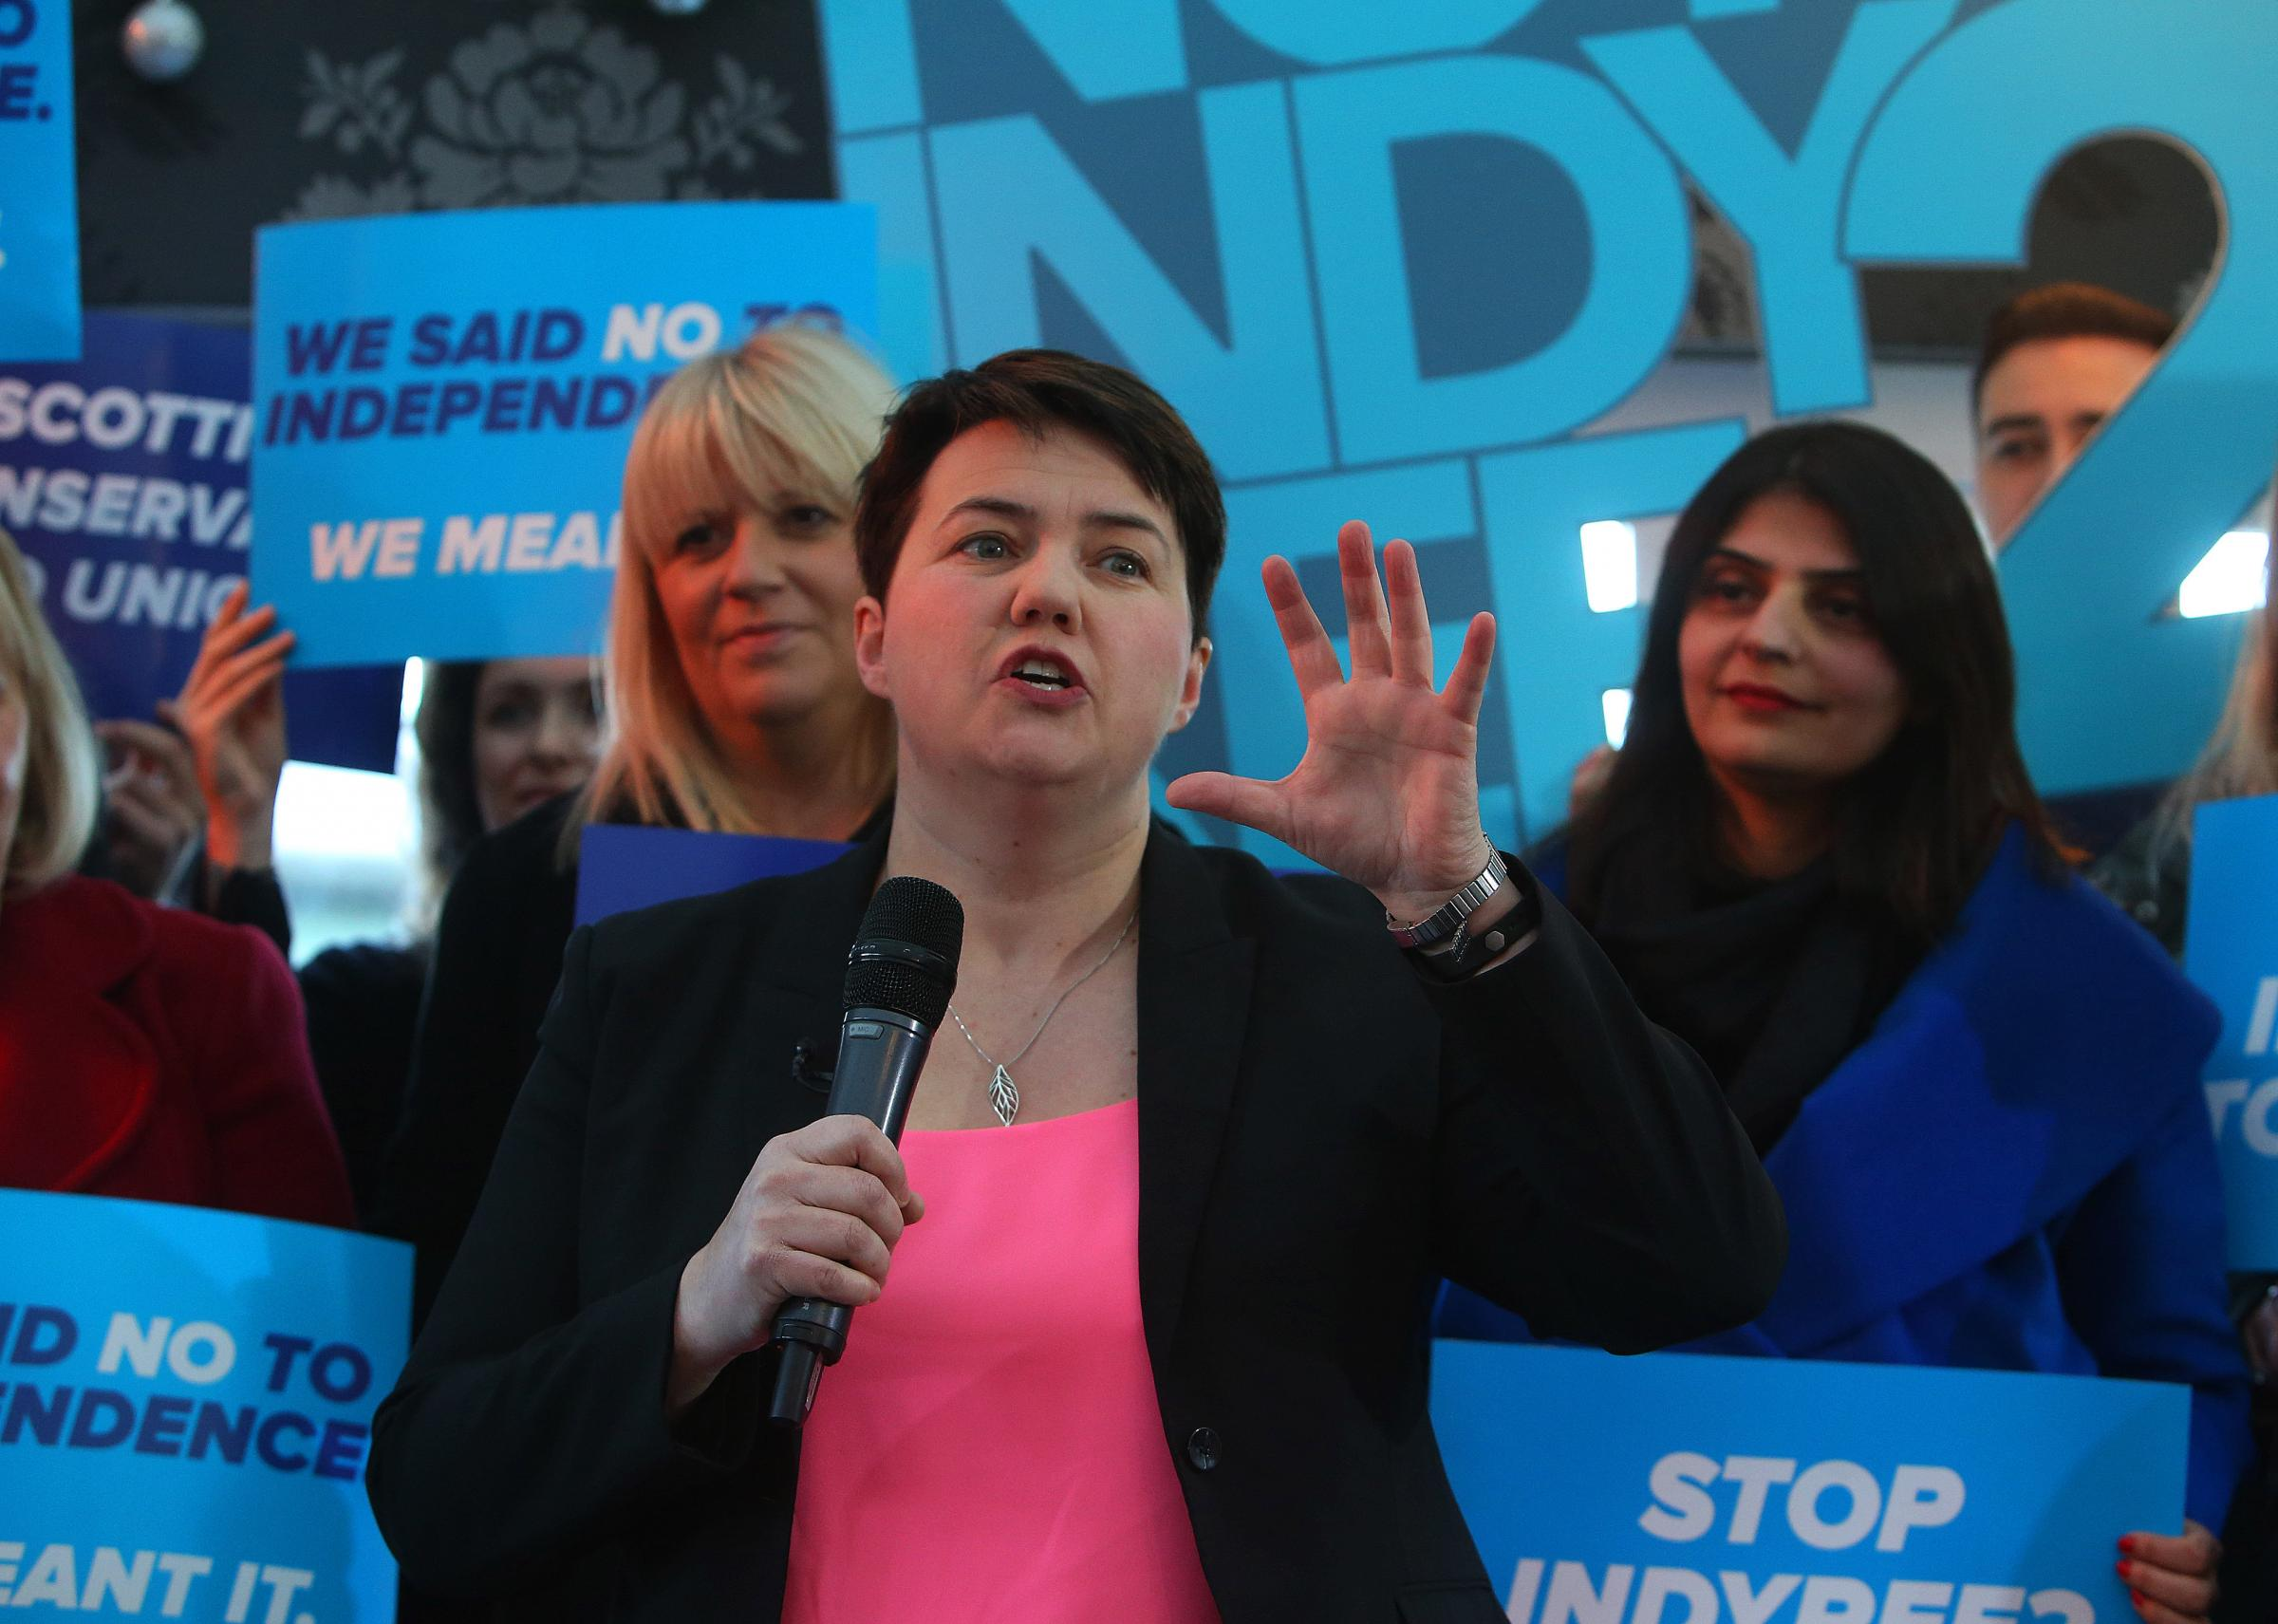 Ruth Davidson: voters now call Nicola Sturgeon 'that f***ing woman'